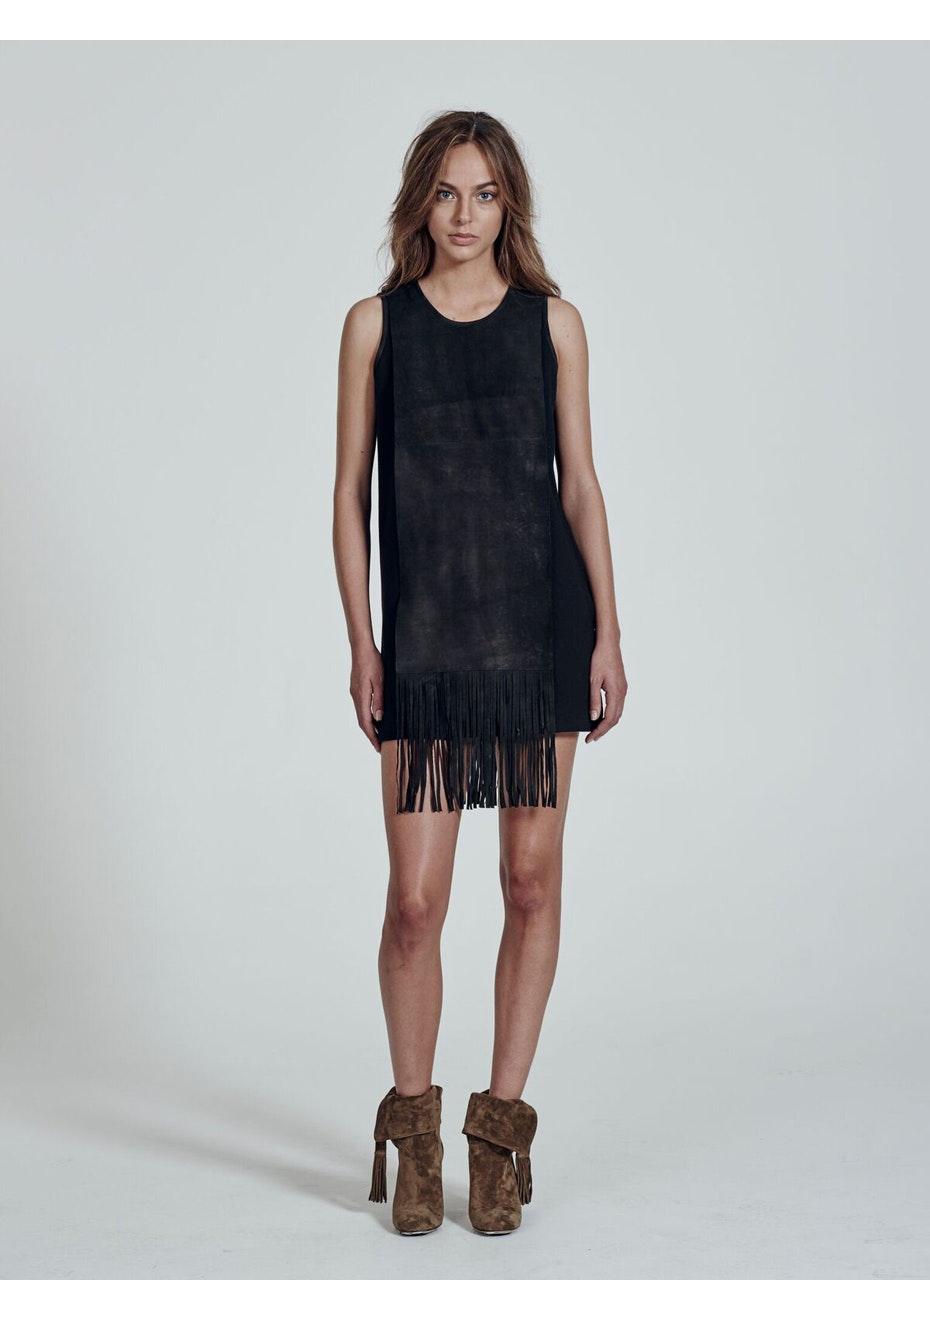 West 14th - Queens Finge Dress  - Matt Black Leather + Black Ponti